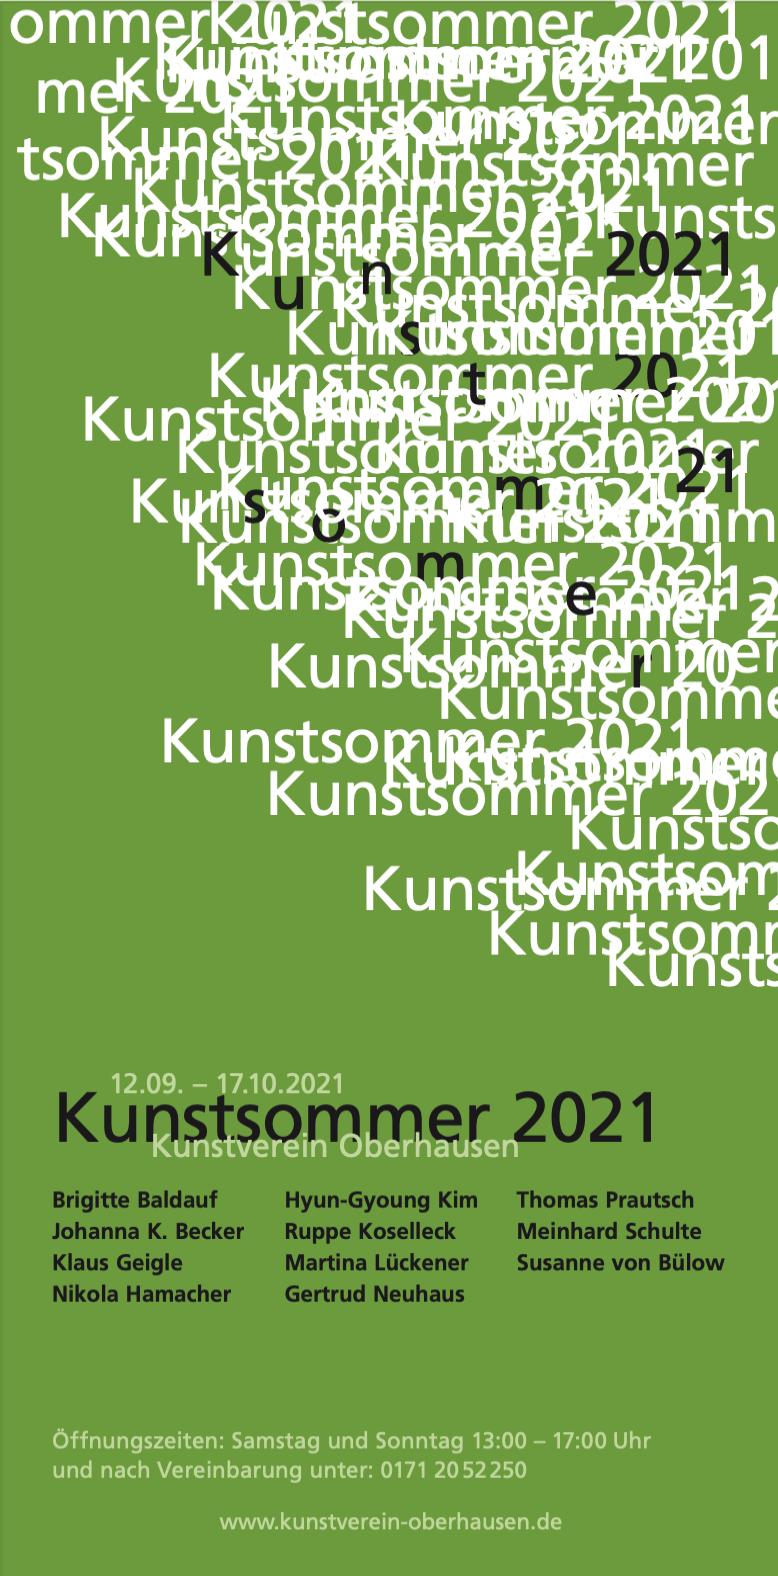 Eventbild für Ruppe Koselleck, Martina Lückener, Gertrud Neuhaus u.a. /// Kunstsommer 2021